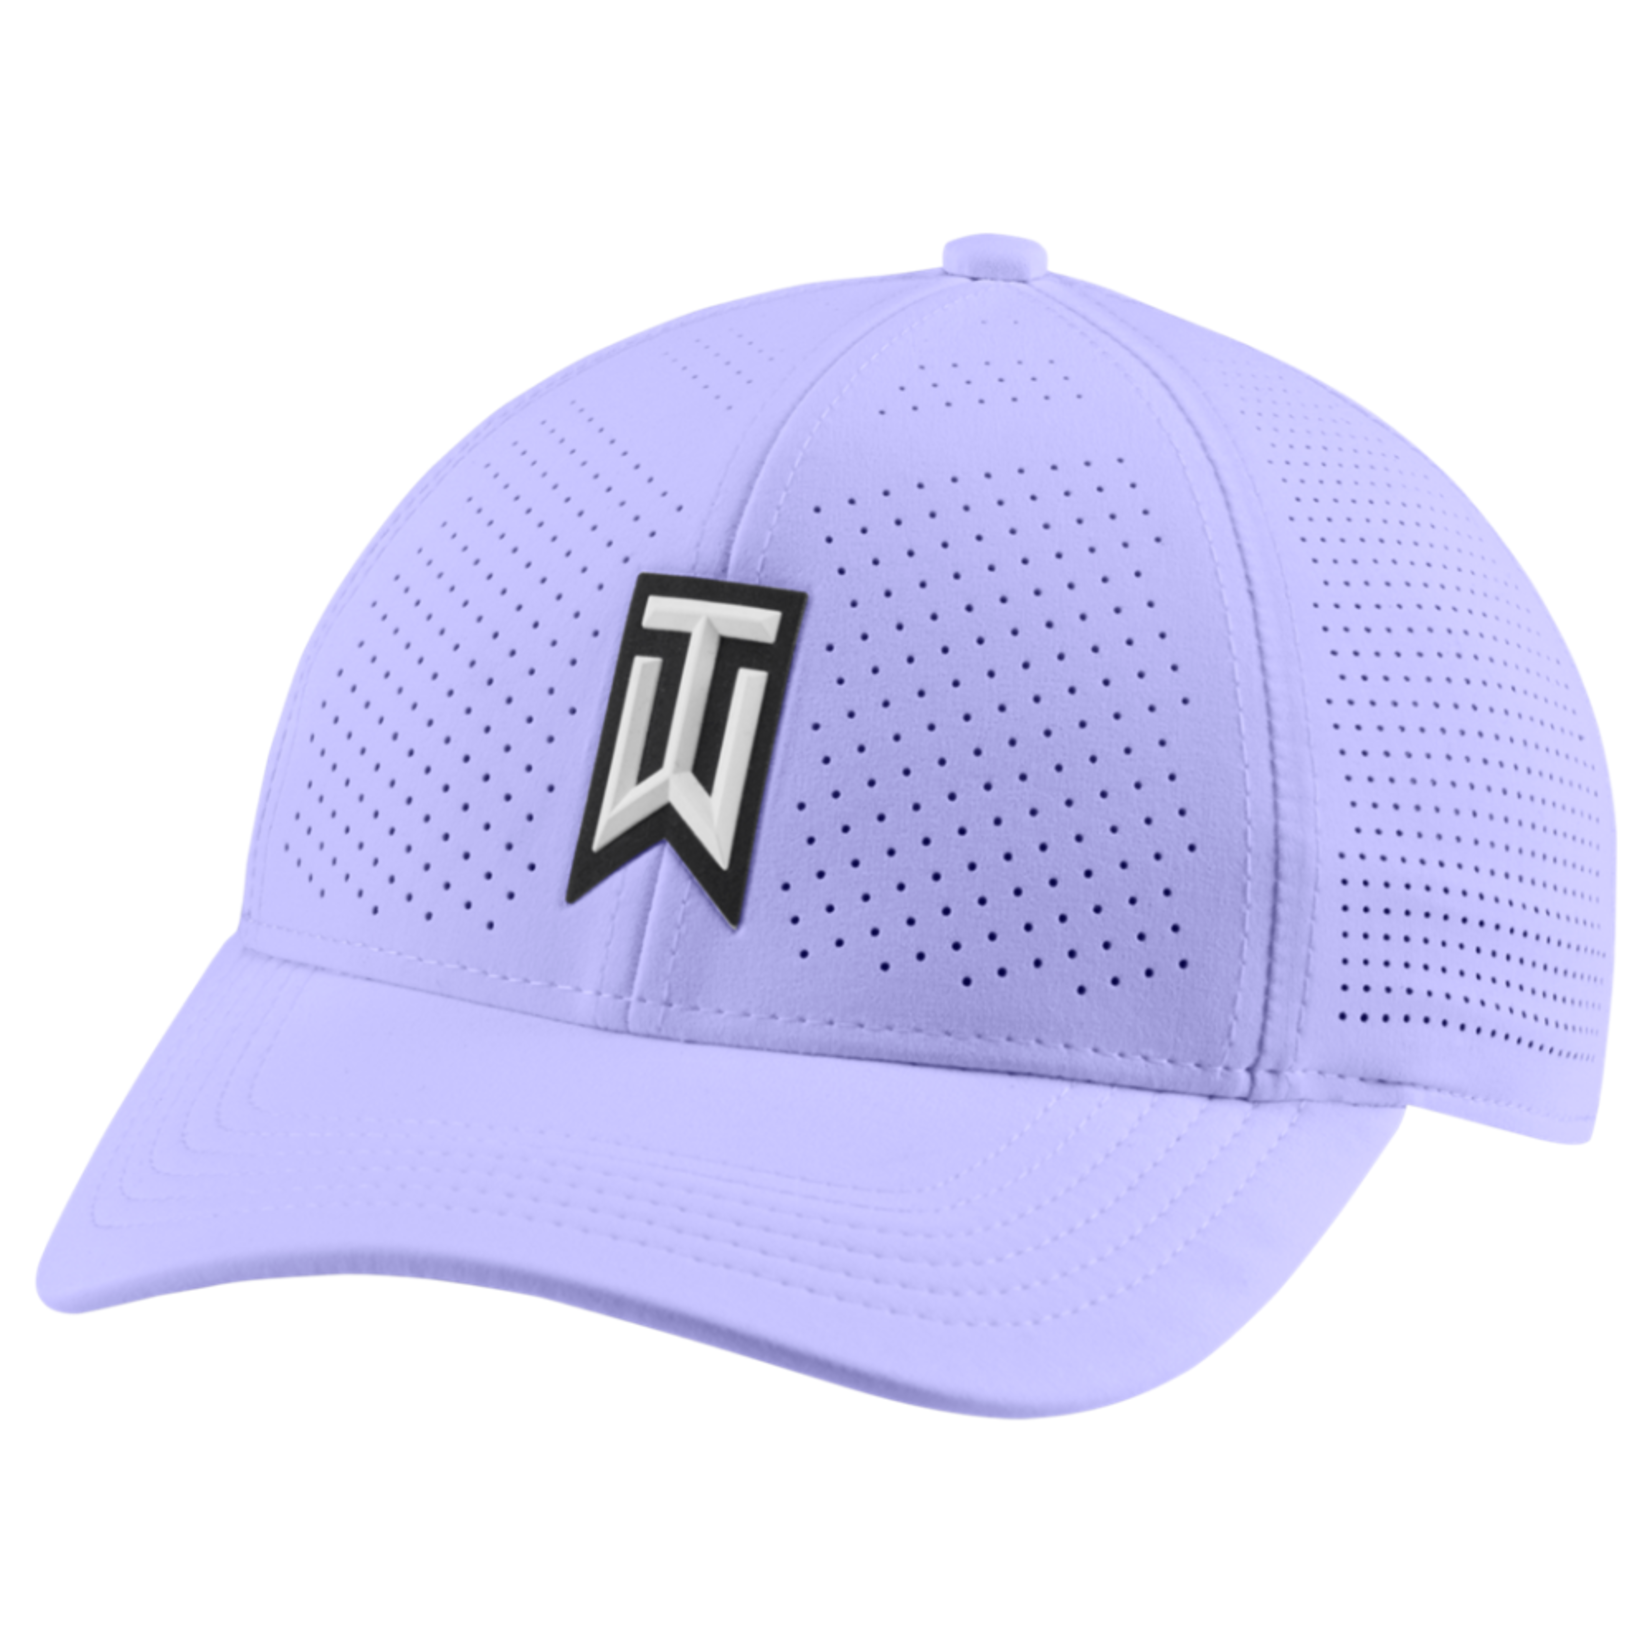 Nike Nike AeroBill TW Heritage86 Hat (21)